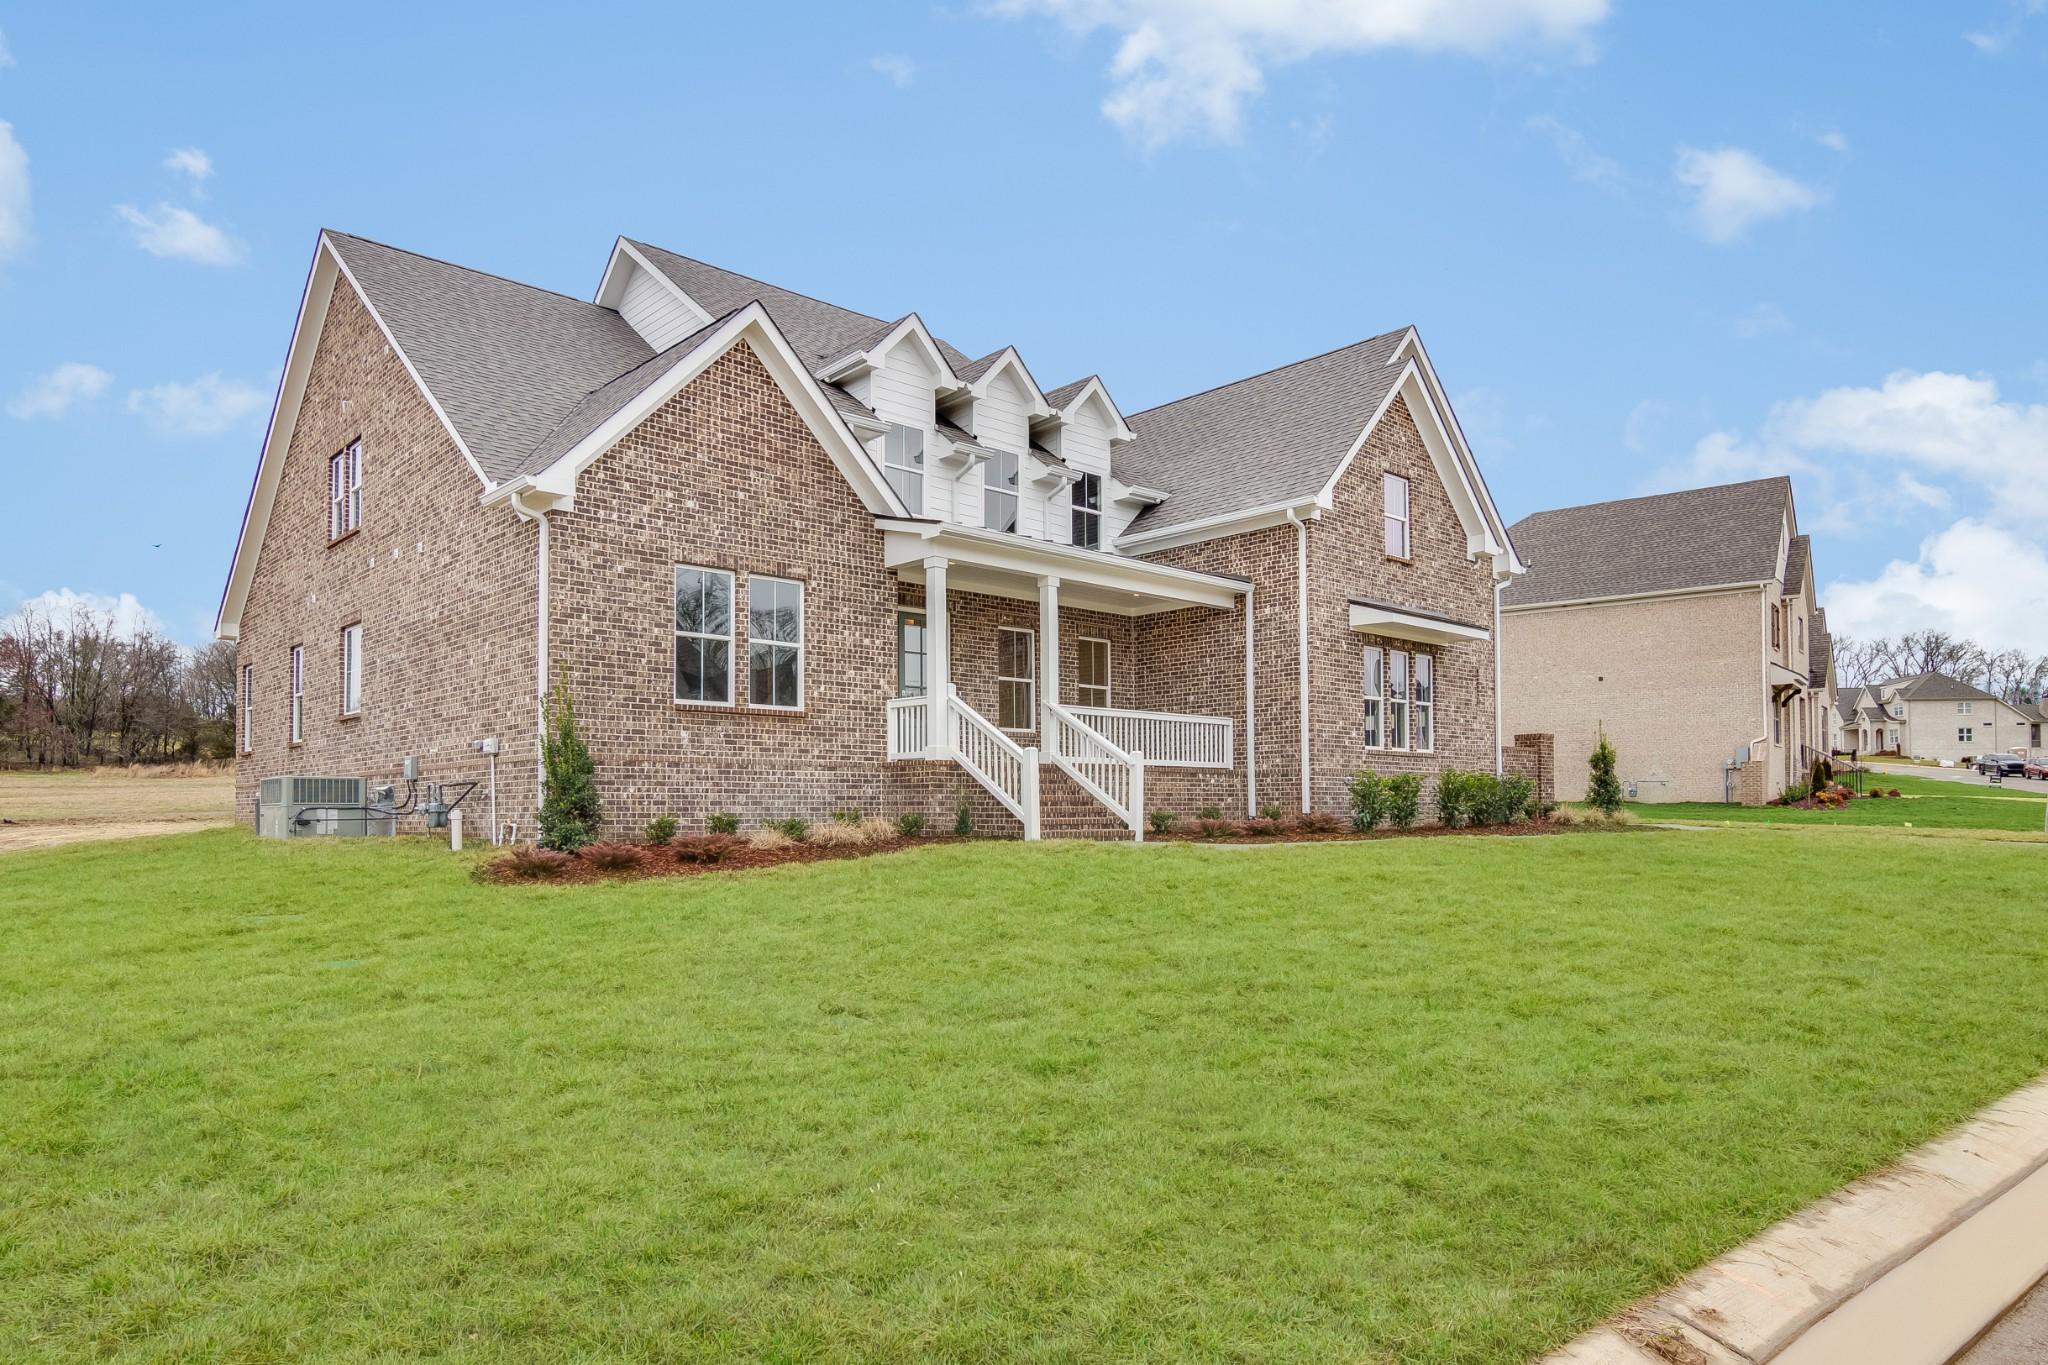 4592 Majestic Meadows Dr LOT843, Arrington, TN 37014 - Arrington, TN real estate listing